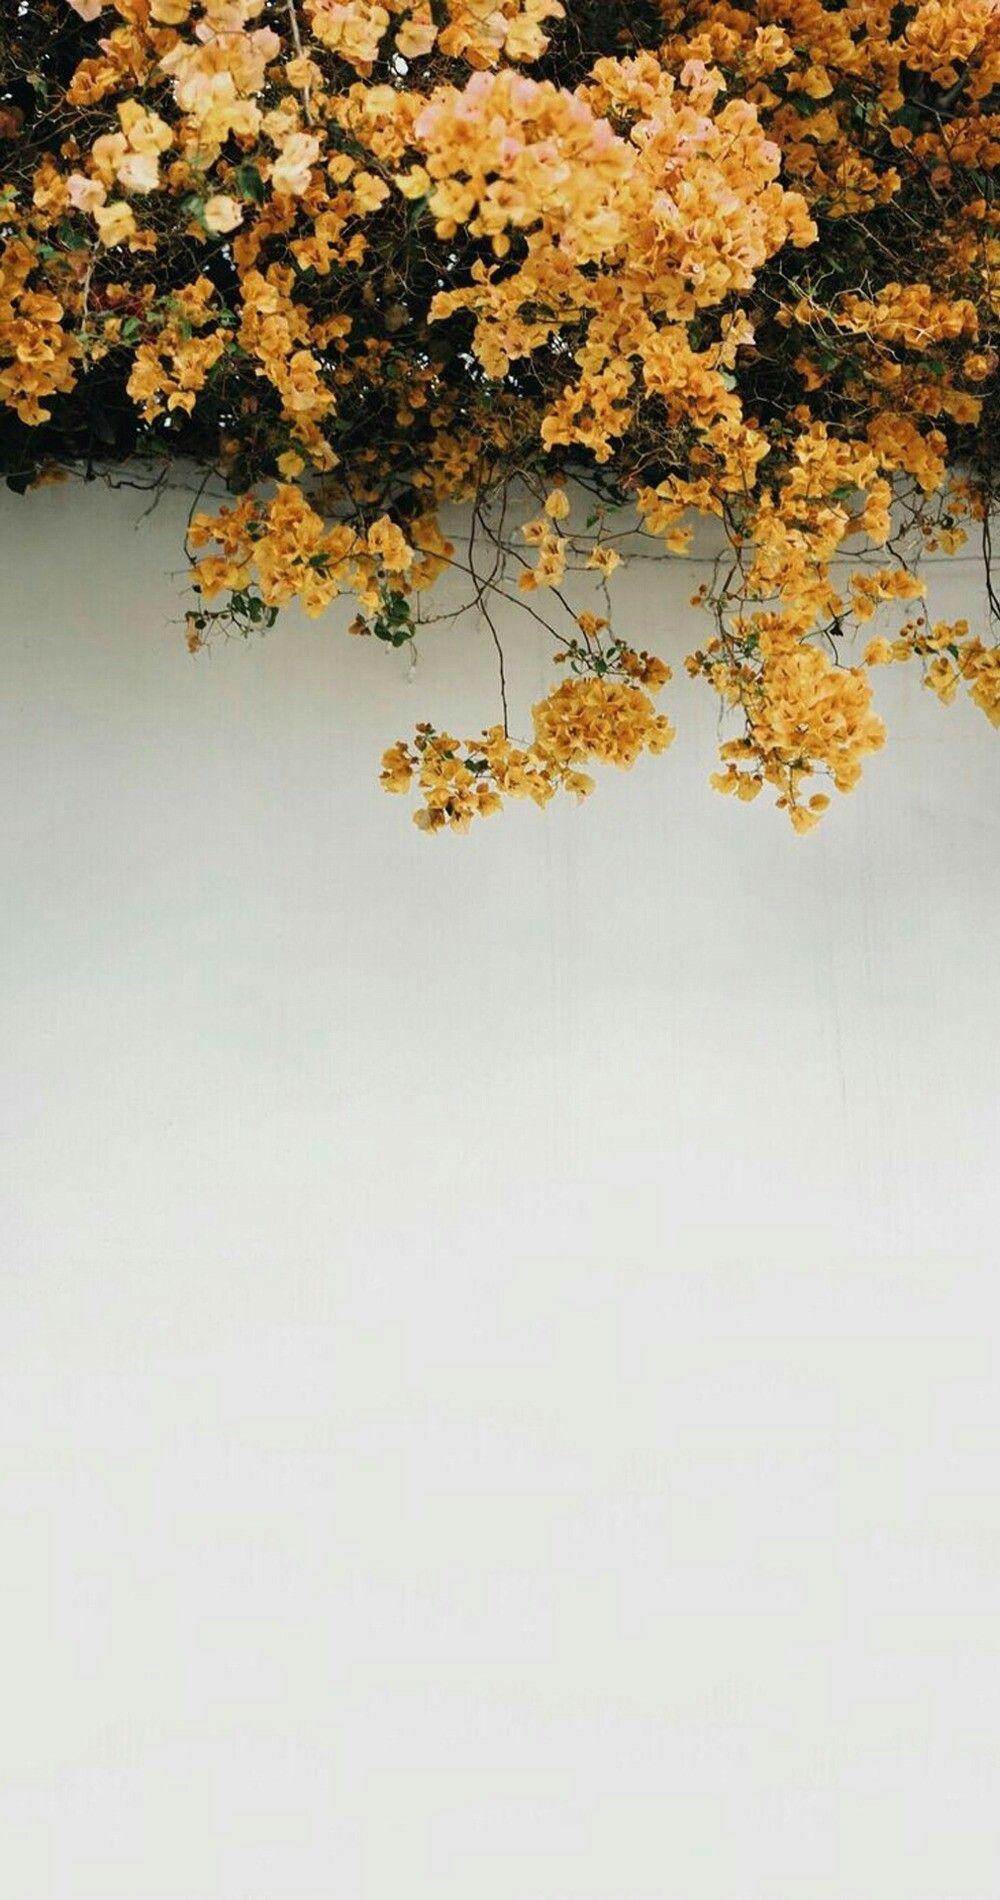 Immagine su Aesthetic wallpapers di Agnes Dorothy H